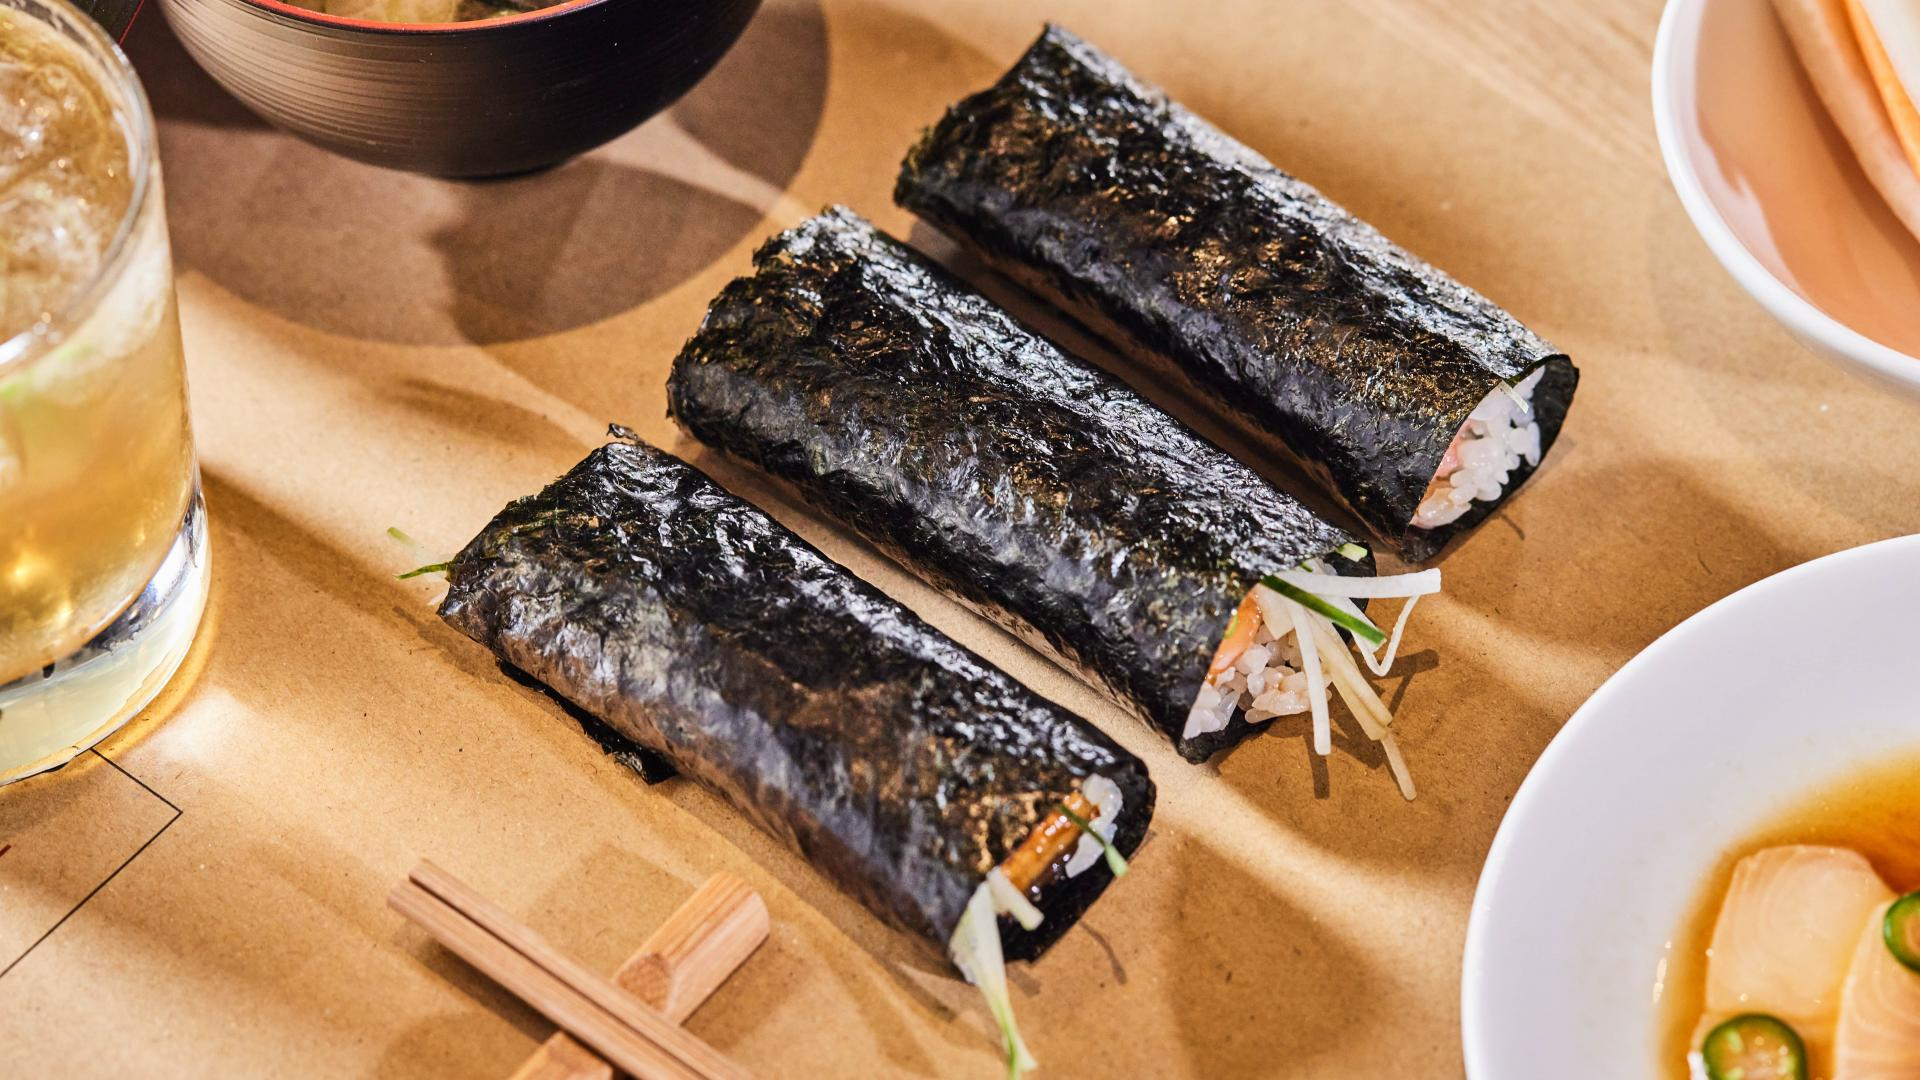 This is a photo of three temaki sushi handrolls from TEMAKI, Brixton Village.